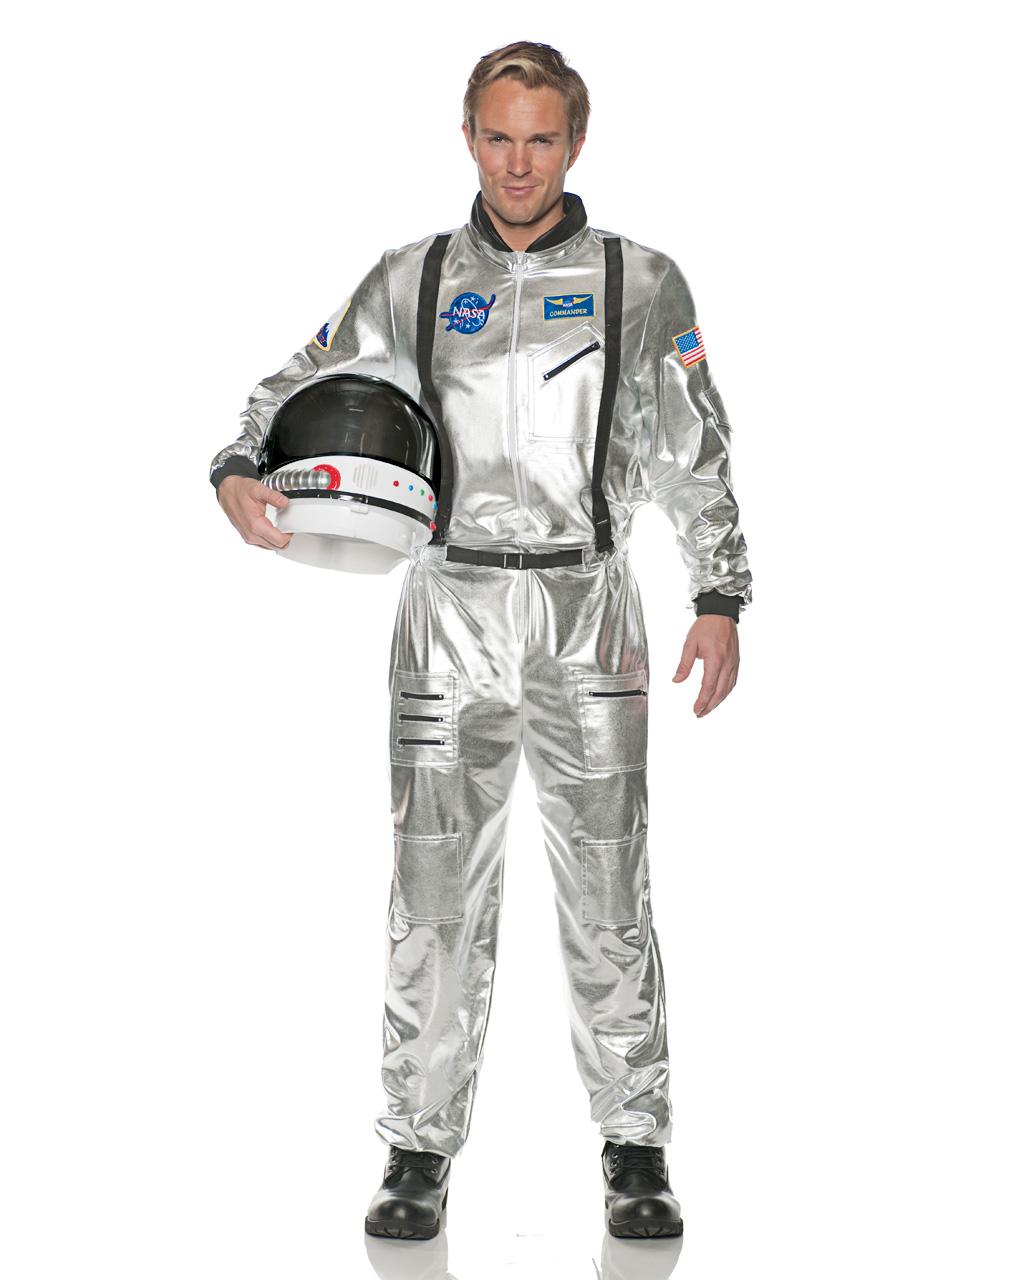 retro astronaut costume - HD1027×1280